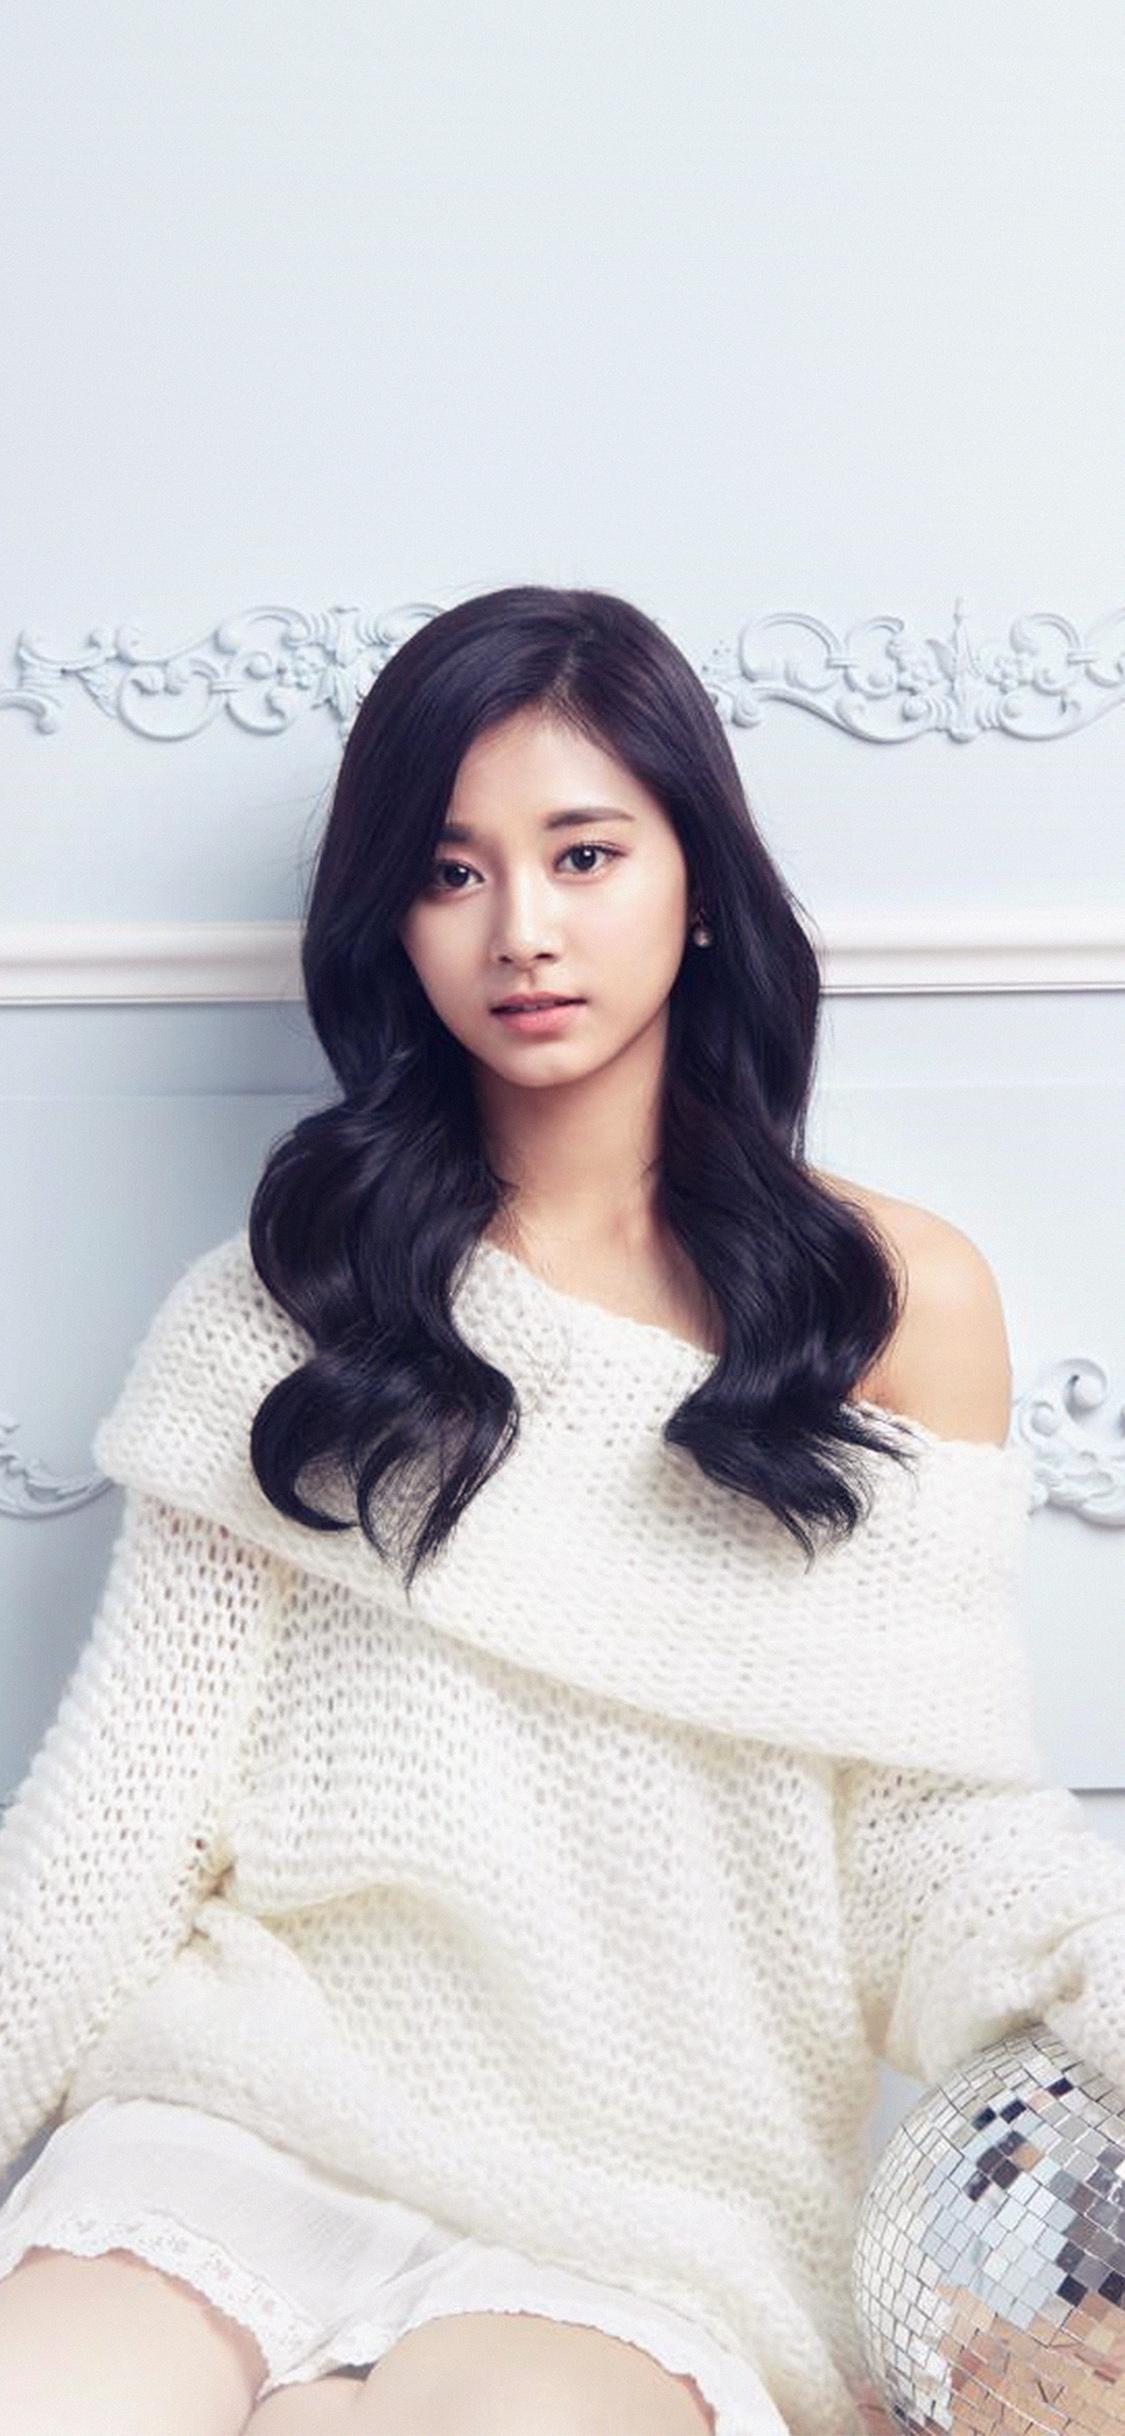 Cute Girl Wallpaper Hd For Android Hm44 Girl Tzuyu Twice Kpop Girl Wallpaper